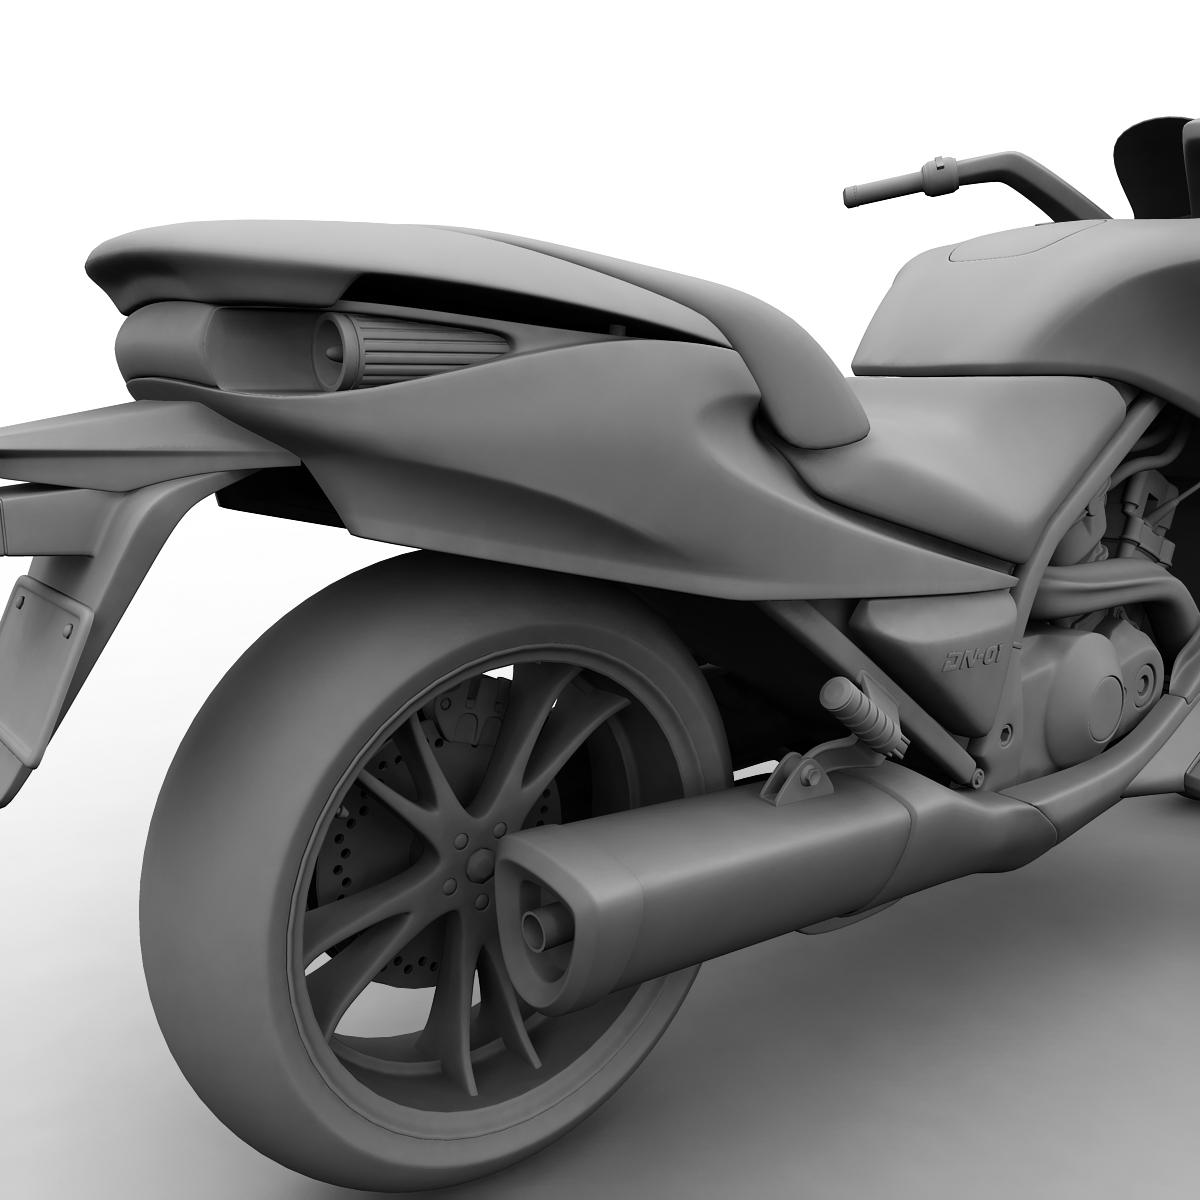 honda dn01 dn 01 3d model | 3d model, Honda, Model